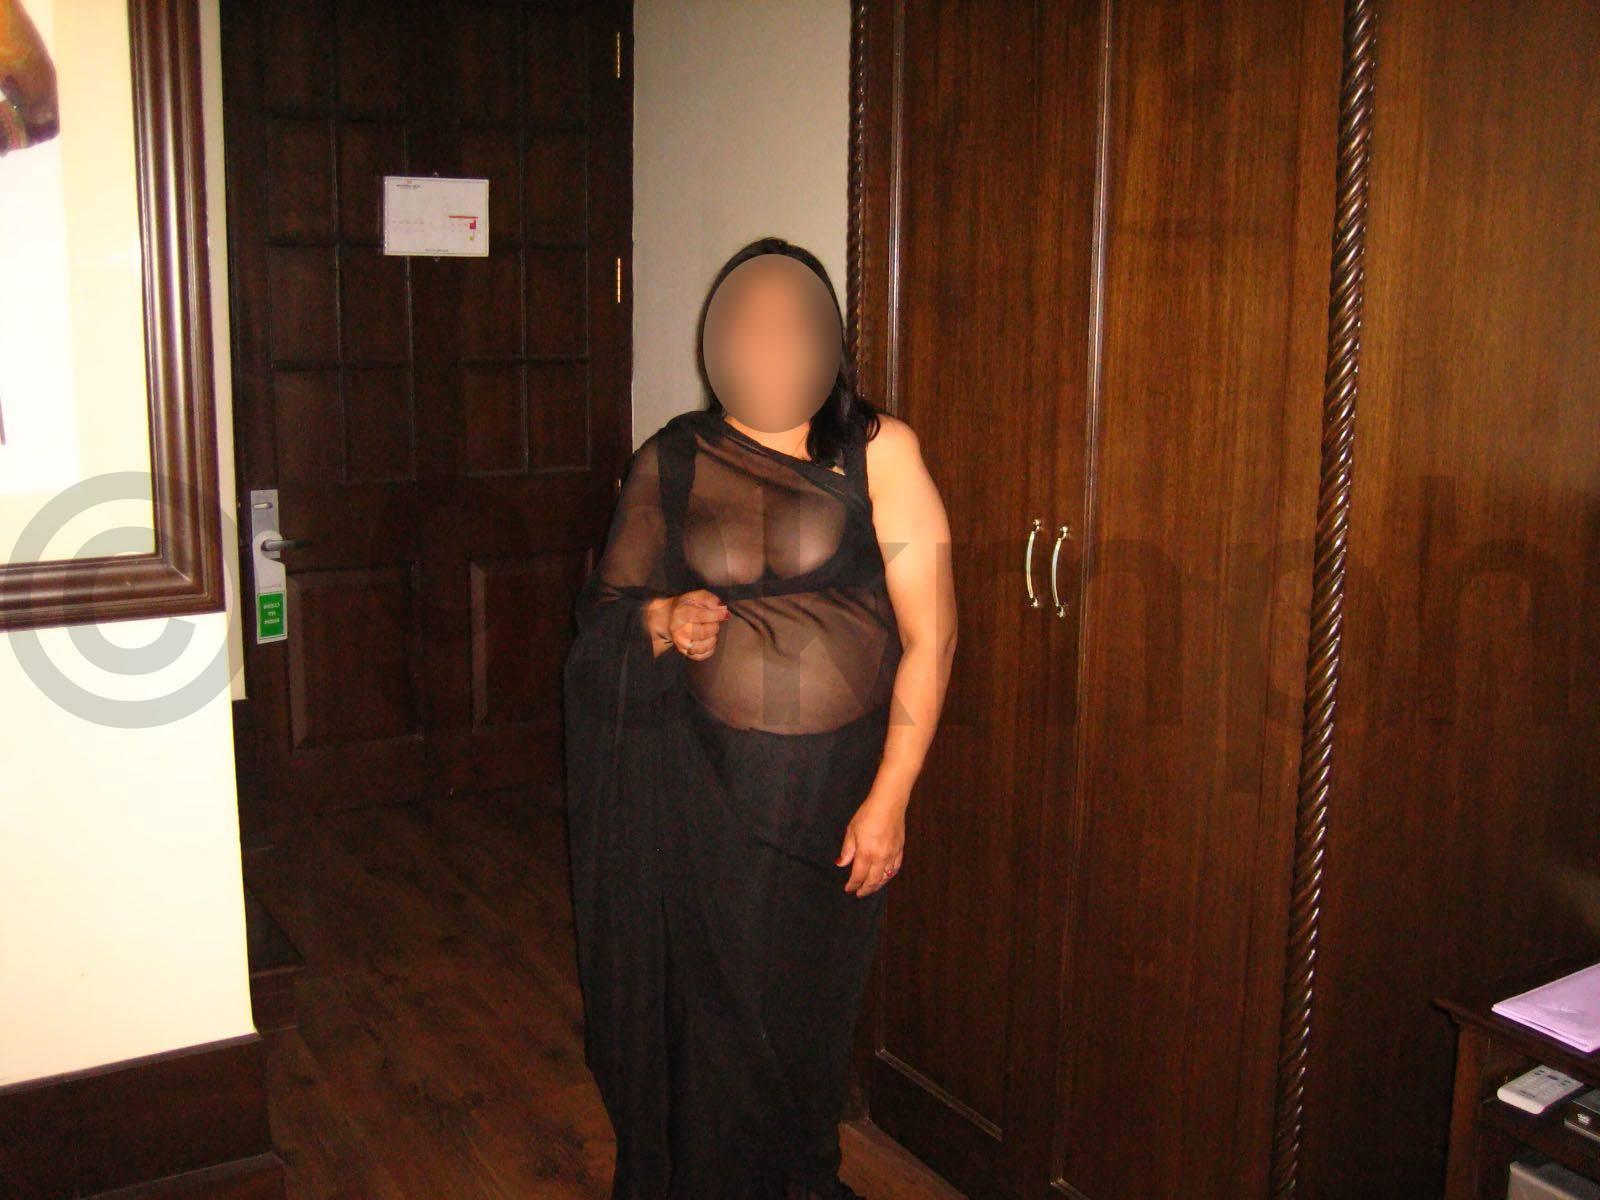 Fat Bhabhi Big Boobs Ass Photo  Latest Moti Indian Aunty -4284